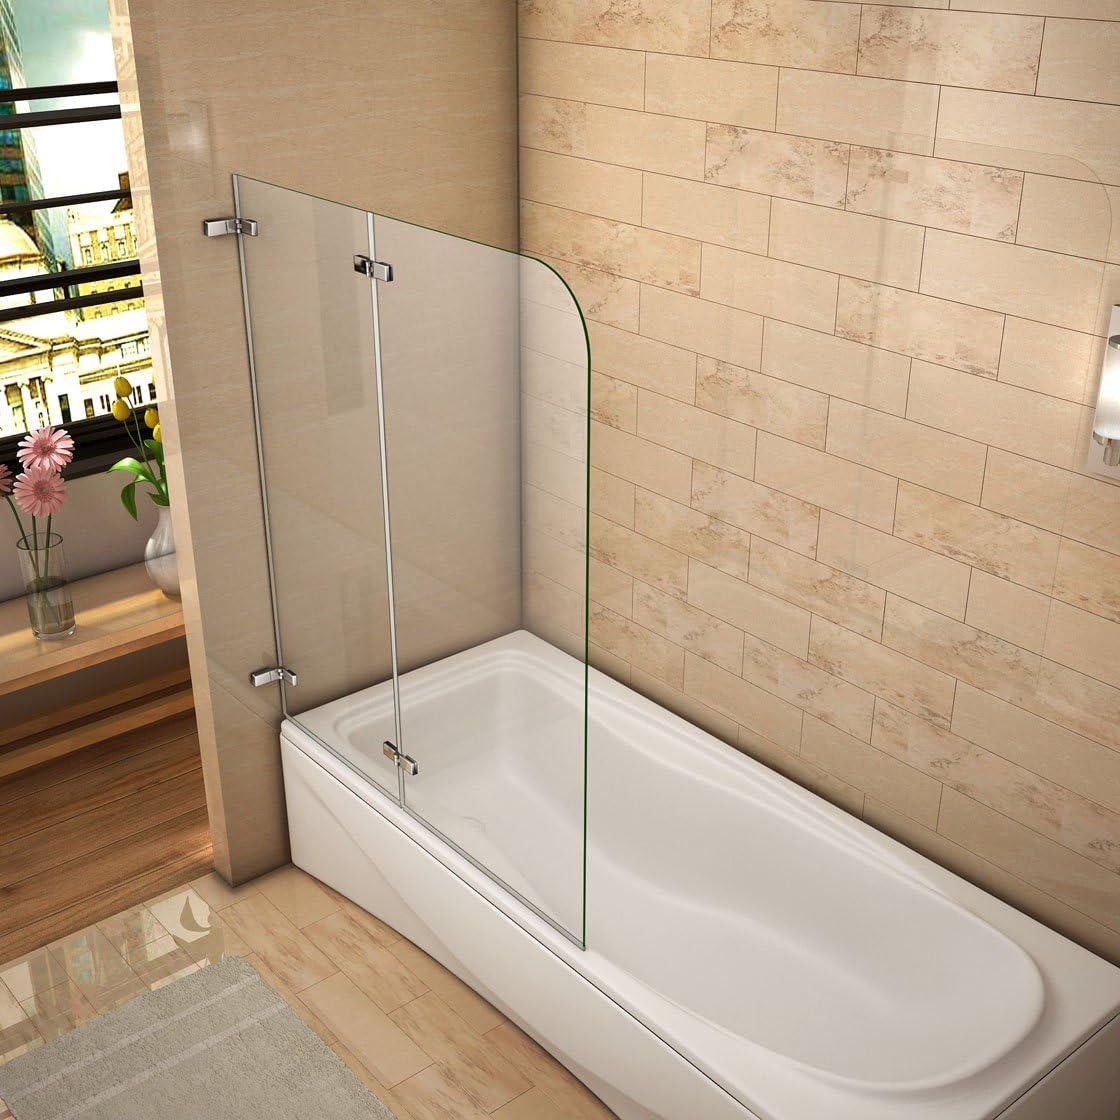 120x140cm Mamparas/pantalla para bañera biombo baño plegable de ...